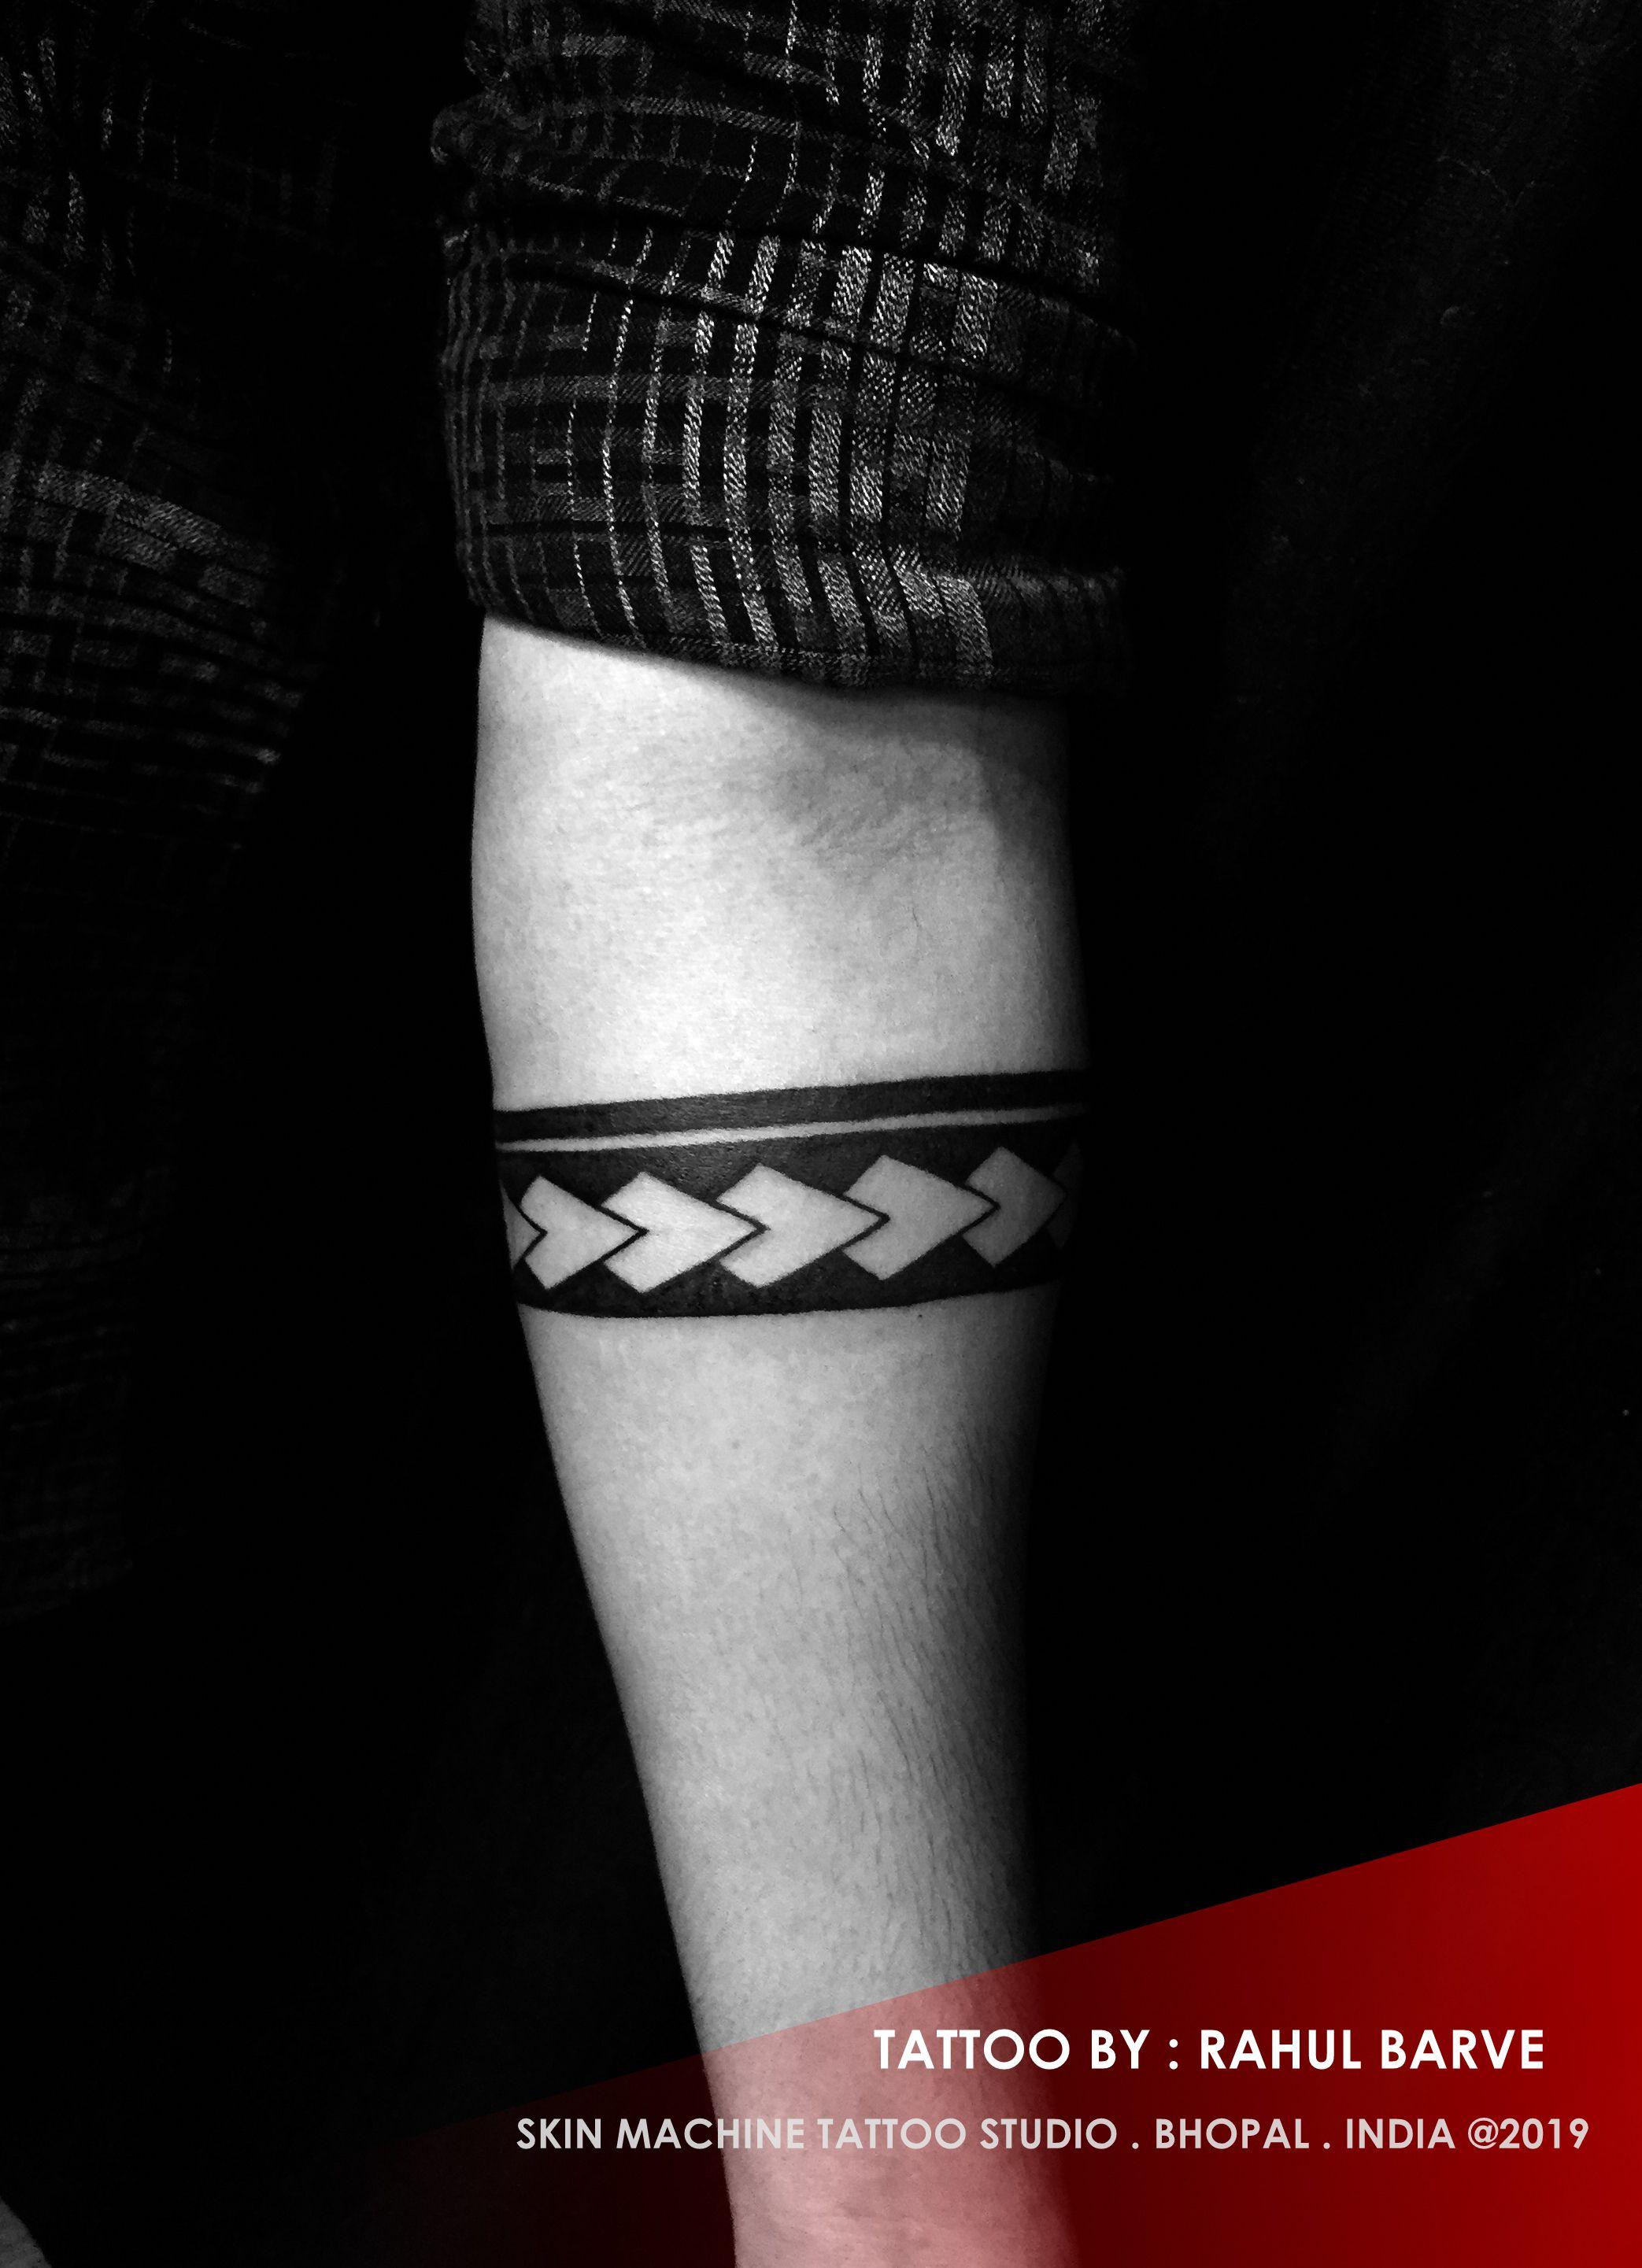 Tribal Armband By Rahul Barve Skin Machine Tattoo Studio Skinmachinetattoo Email For Appointments Forearm Band Tattoos Trishul Tattoo Designs Hand Tattoos